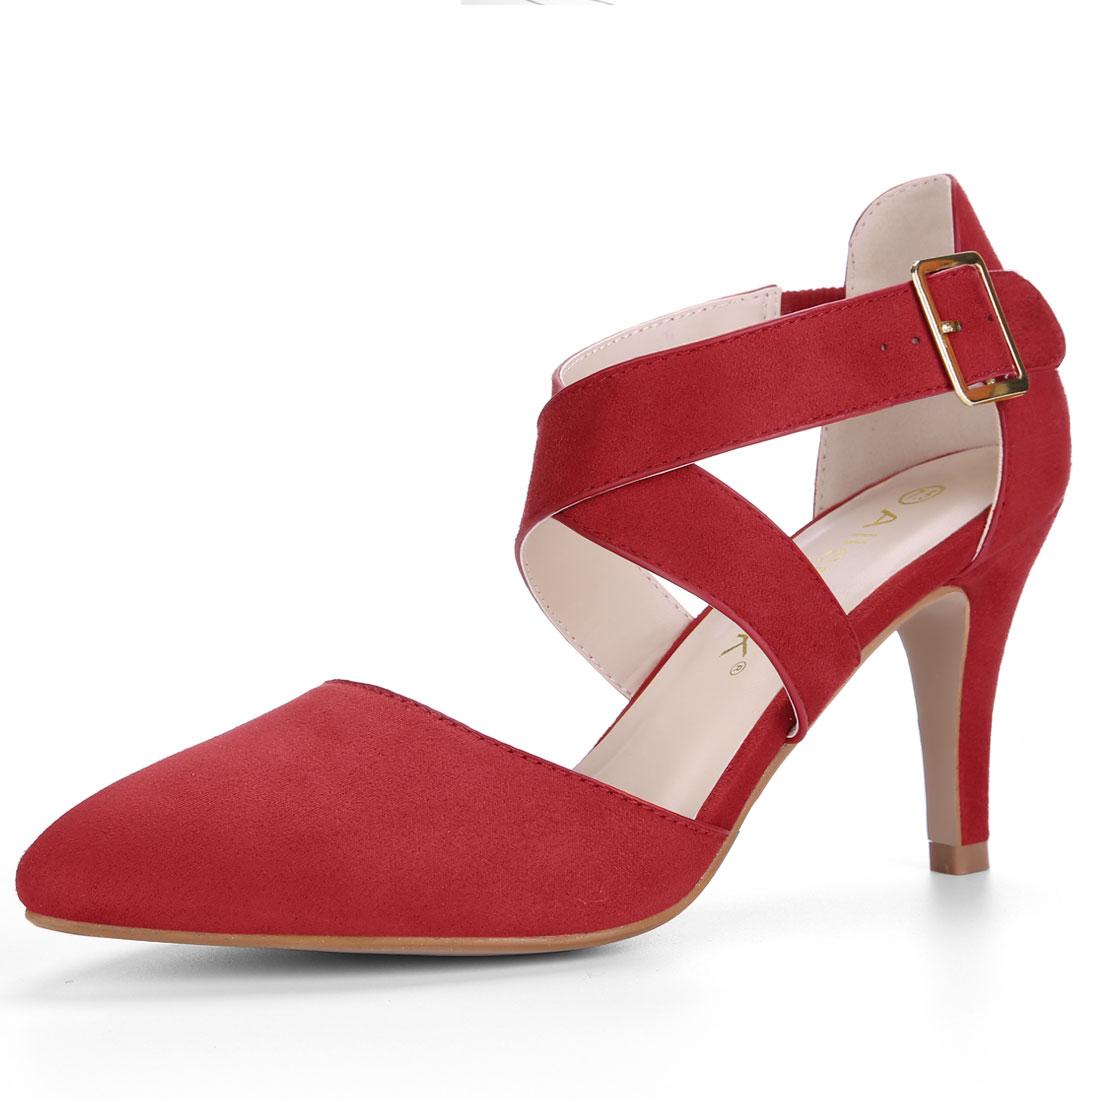 Allegra K Women's Crisscross Straps Stiletto Heel Ankle Strap Pumps Red US 8